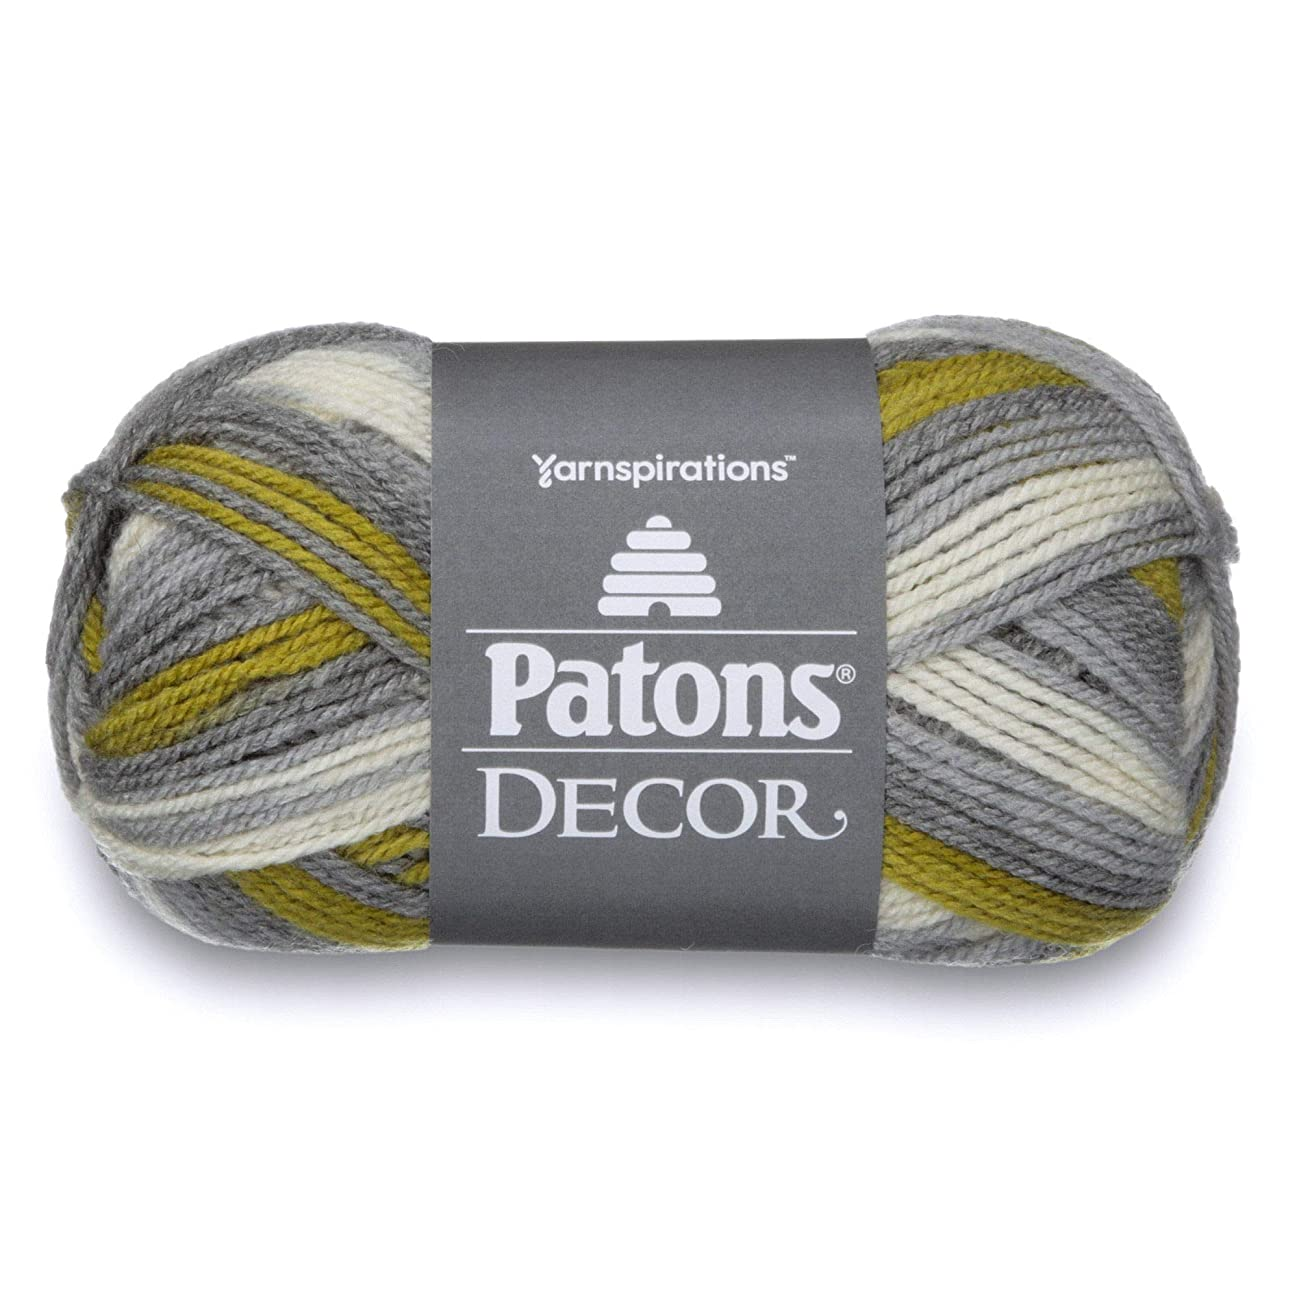 Patons  Decor Yarn - (4) Medium Worsted Gauge  - 3.5oz -  Frond -   For Crochet, Knitting & Crafting